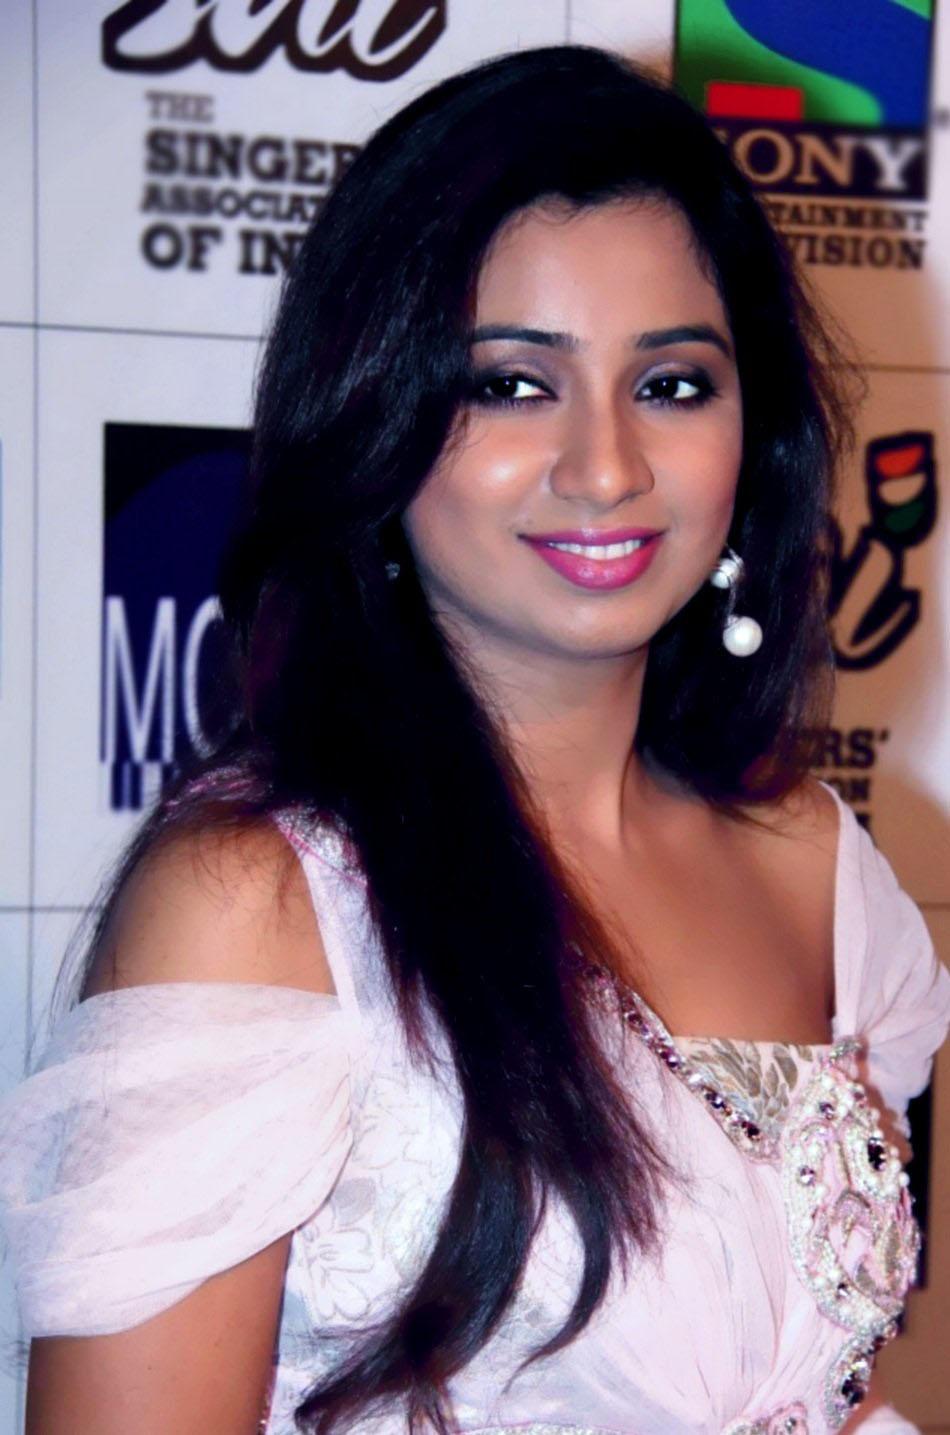 Bollywood Pics Pix4World Shreya Ghoshal Hot And Sexy Hd -5871